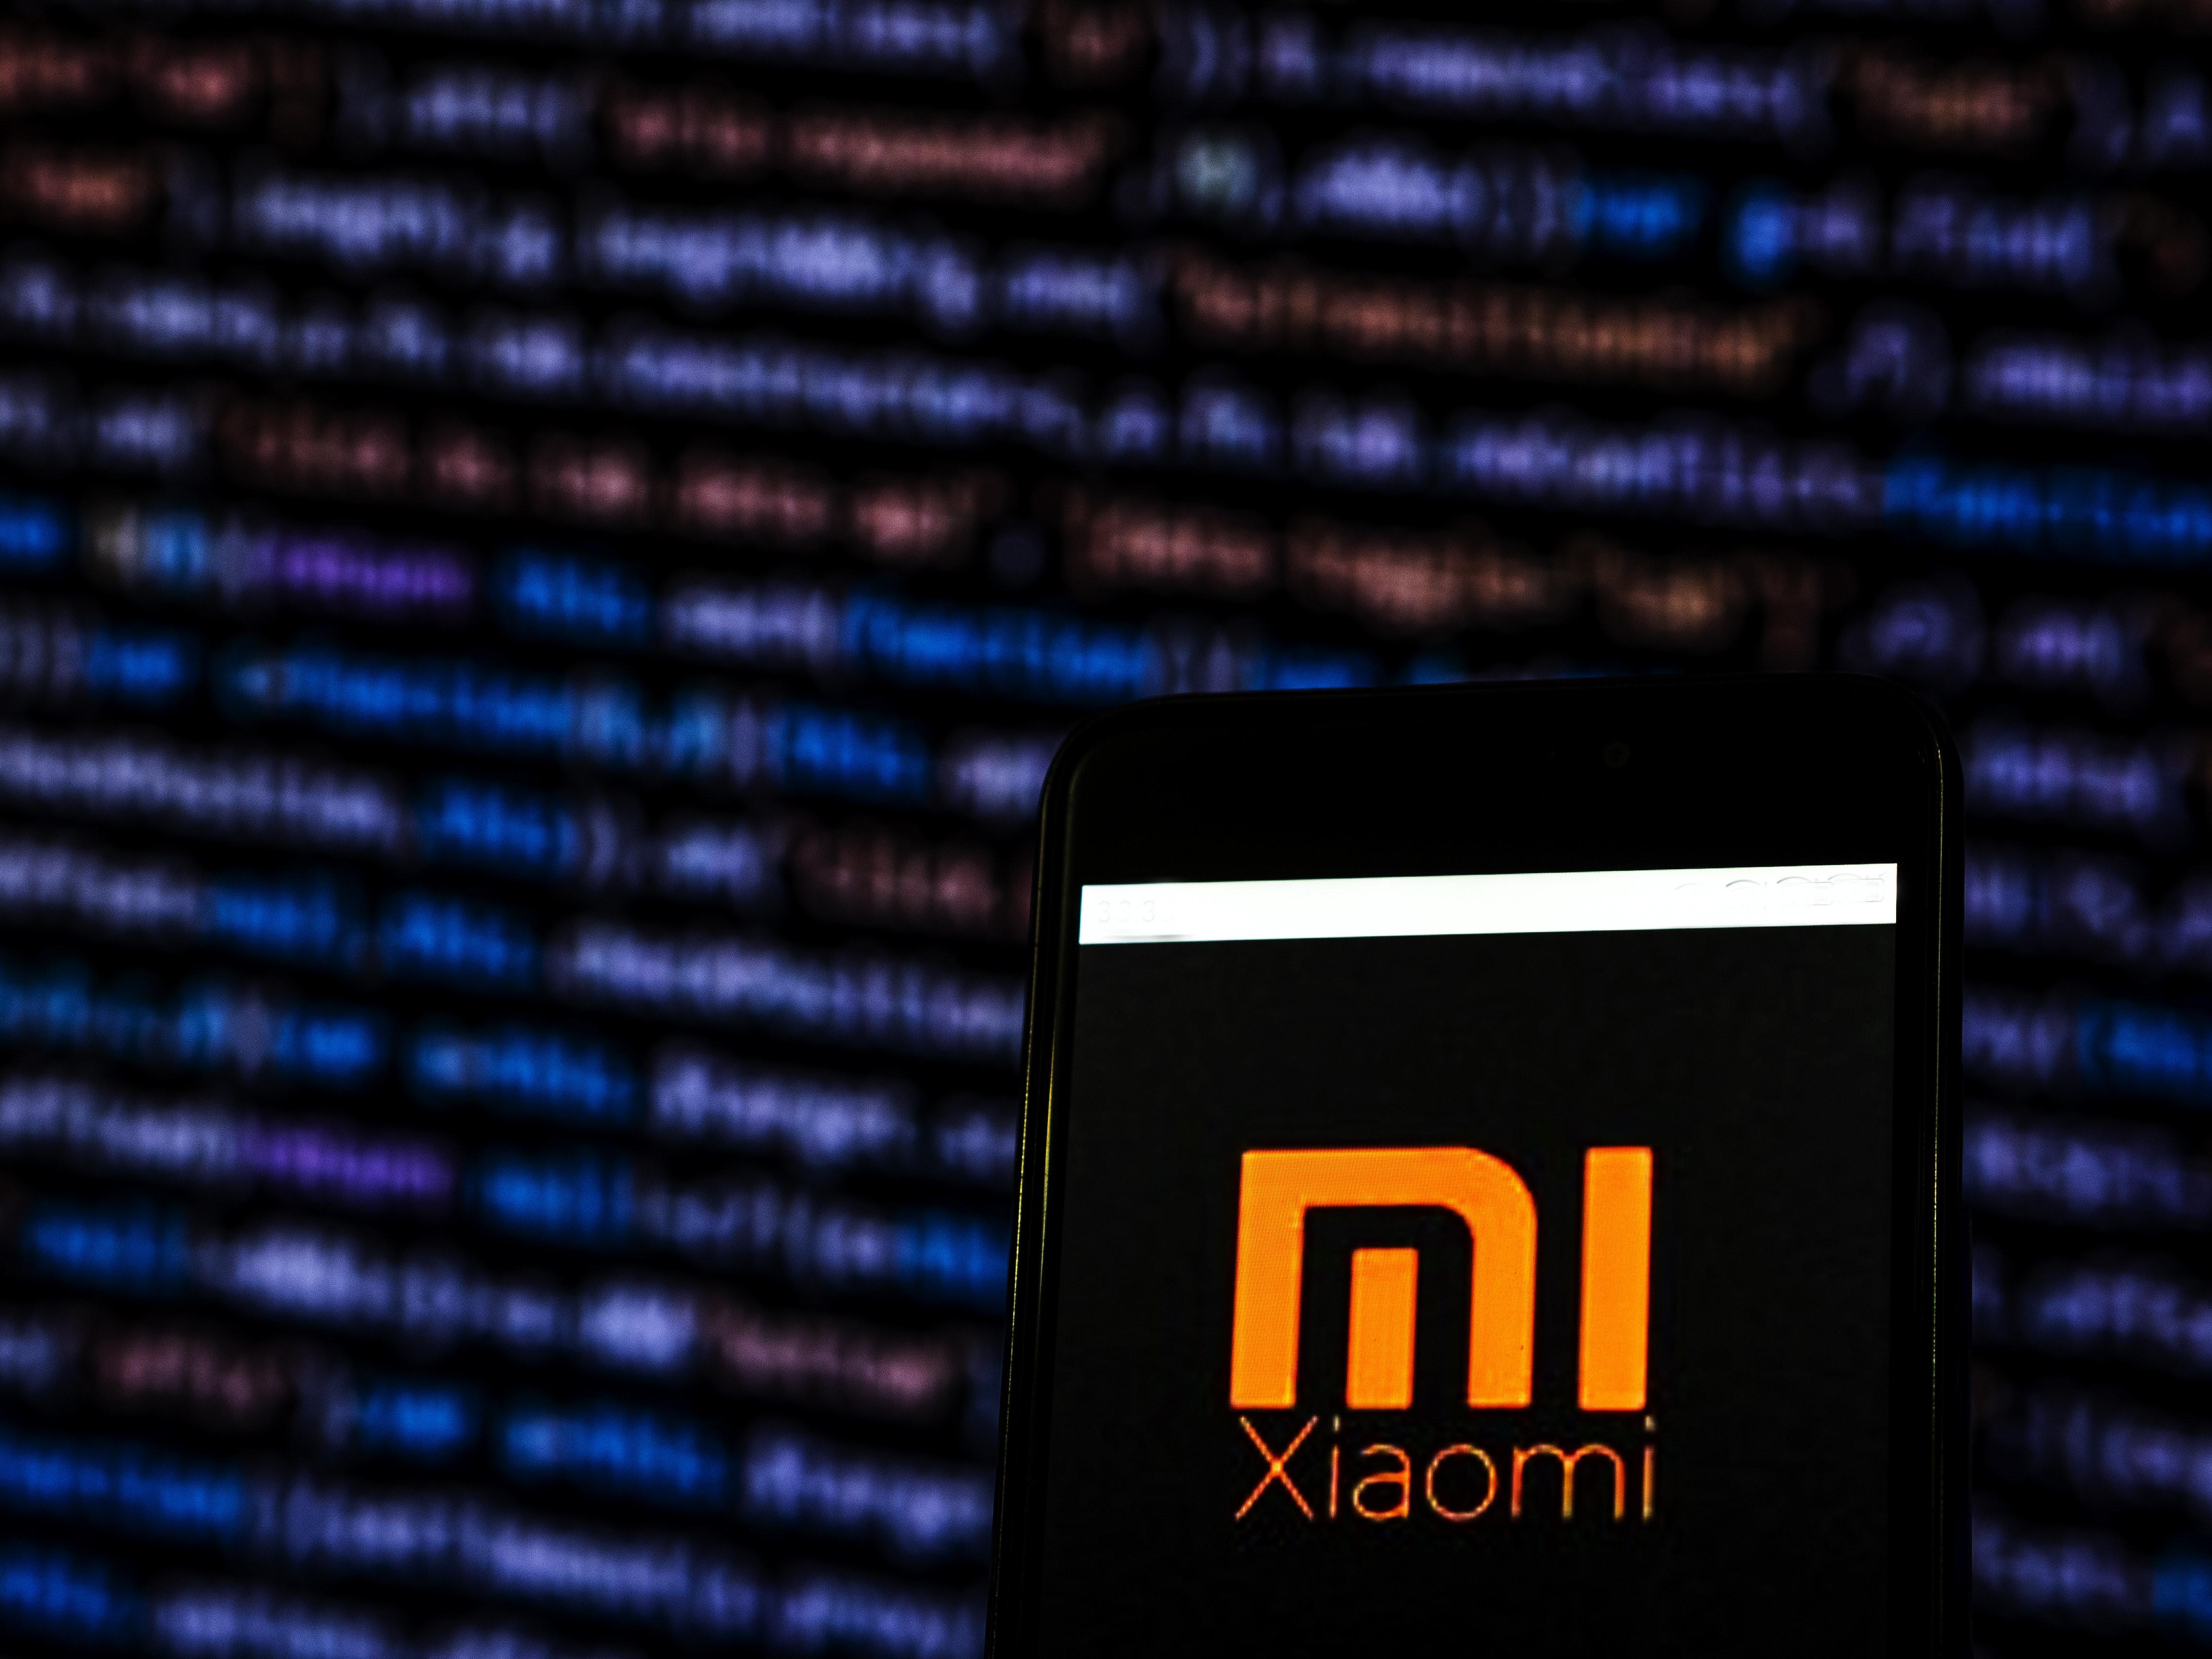 В КНР  показали сгибающийся смартфон-планшет